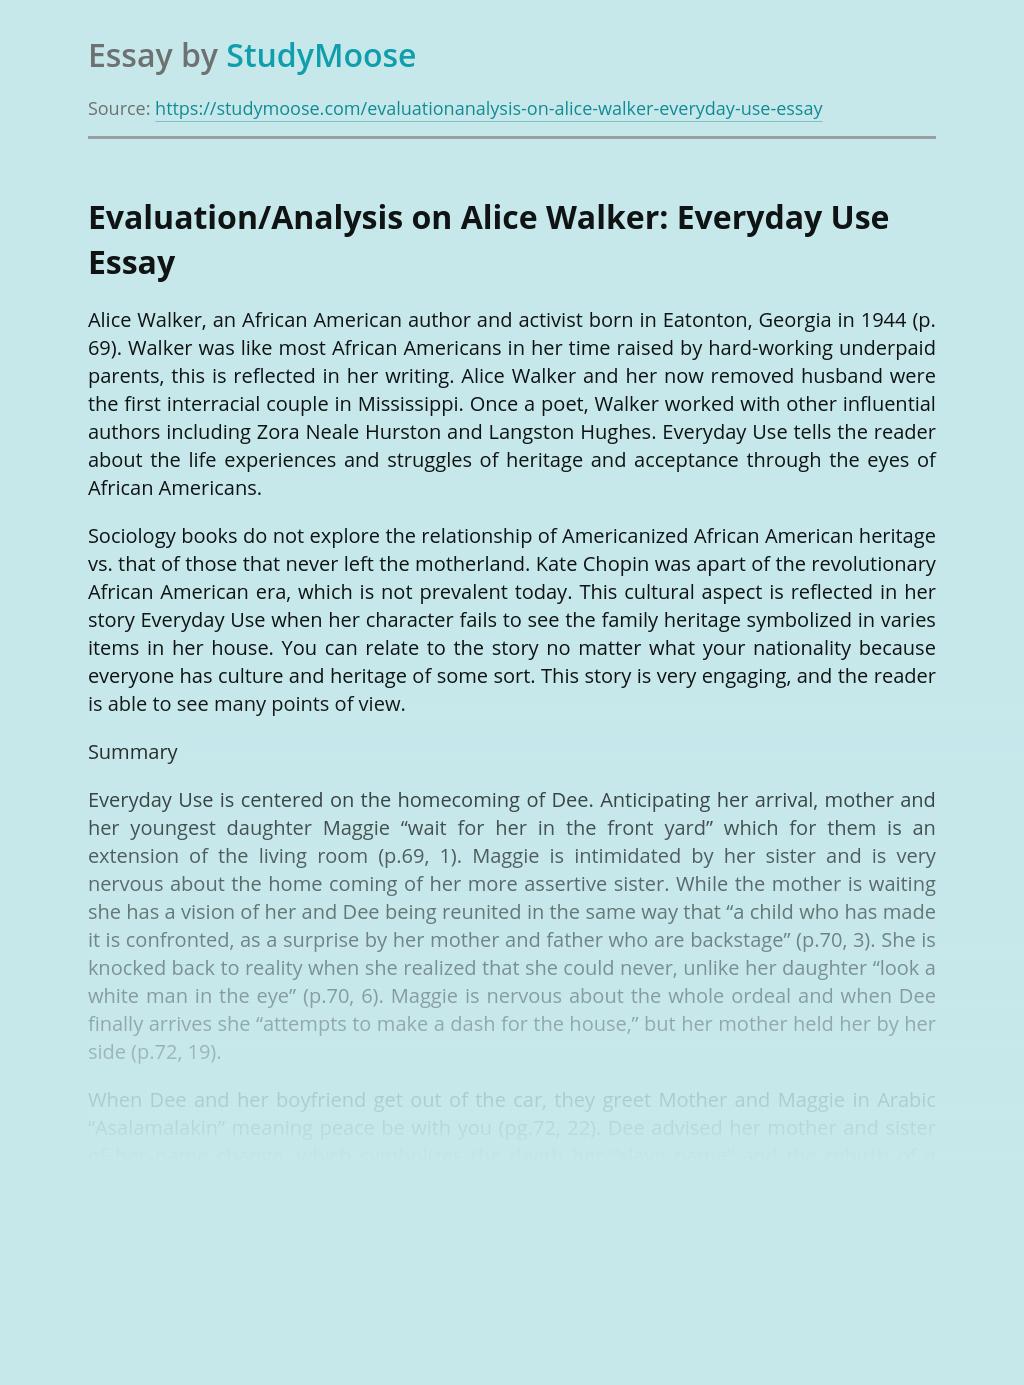 Evaluation/Analysis on Alice Walker: Everyday Use